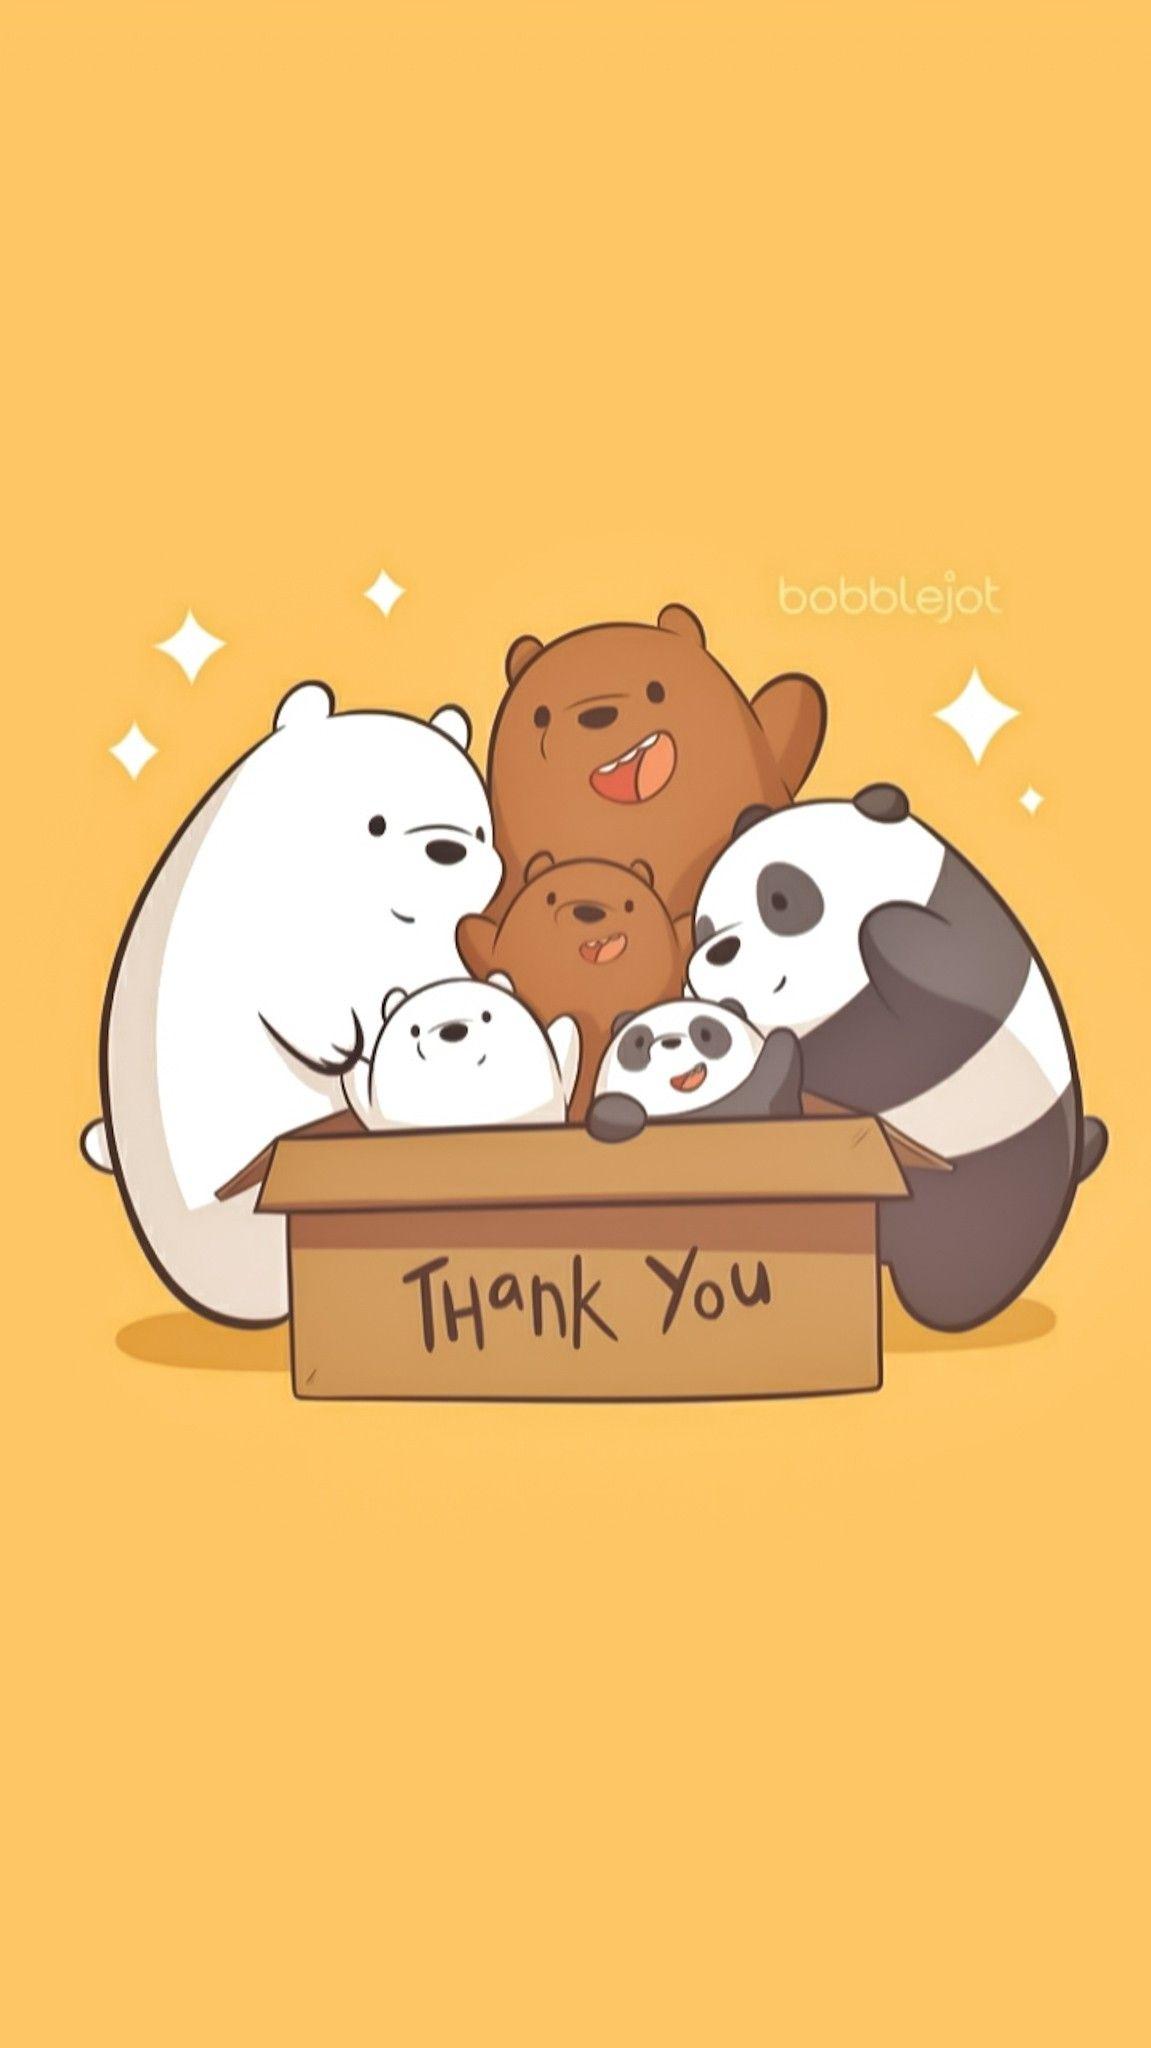 Pin Oleh Aekkalisa Di We Bear Bears Di 2020 Boneka Hewan Kartun Hewan